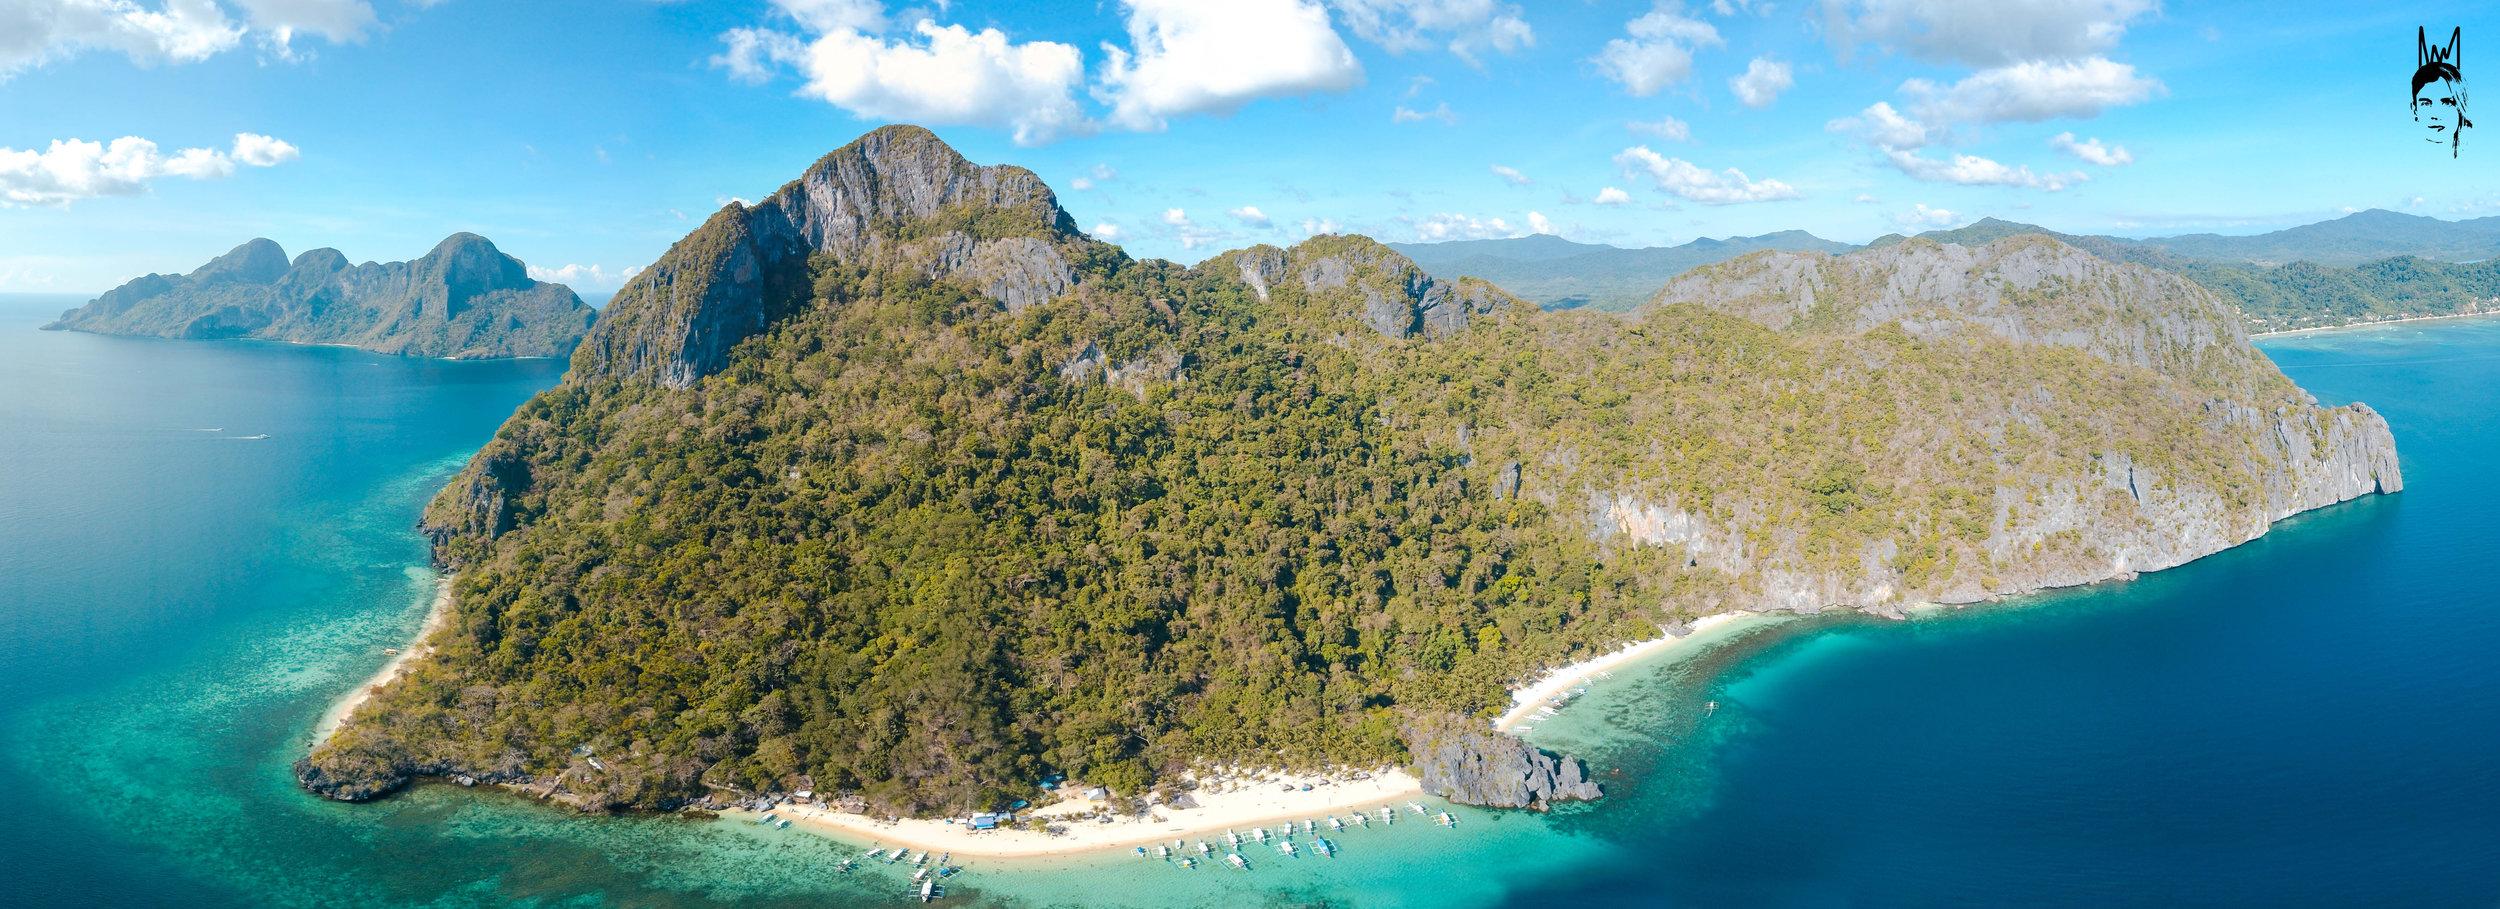 7 Commando Beach, the last stop on Tour A